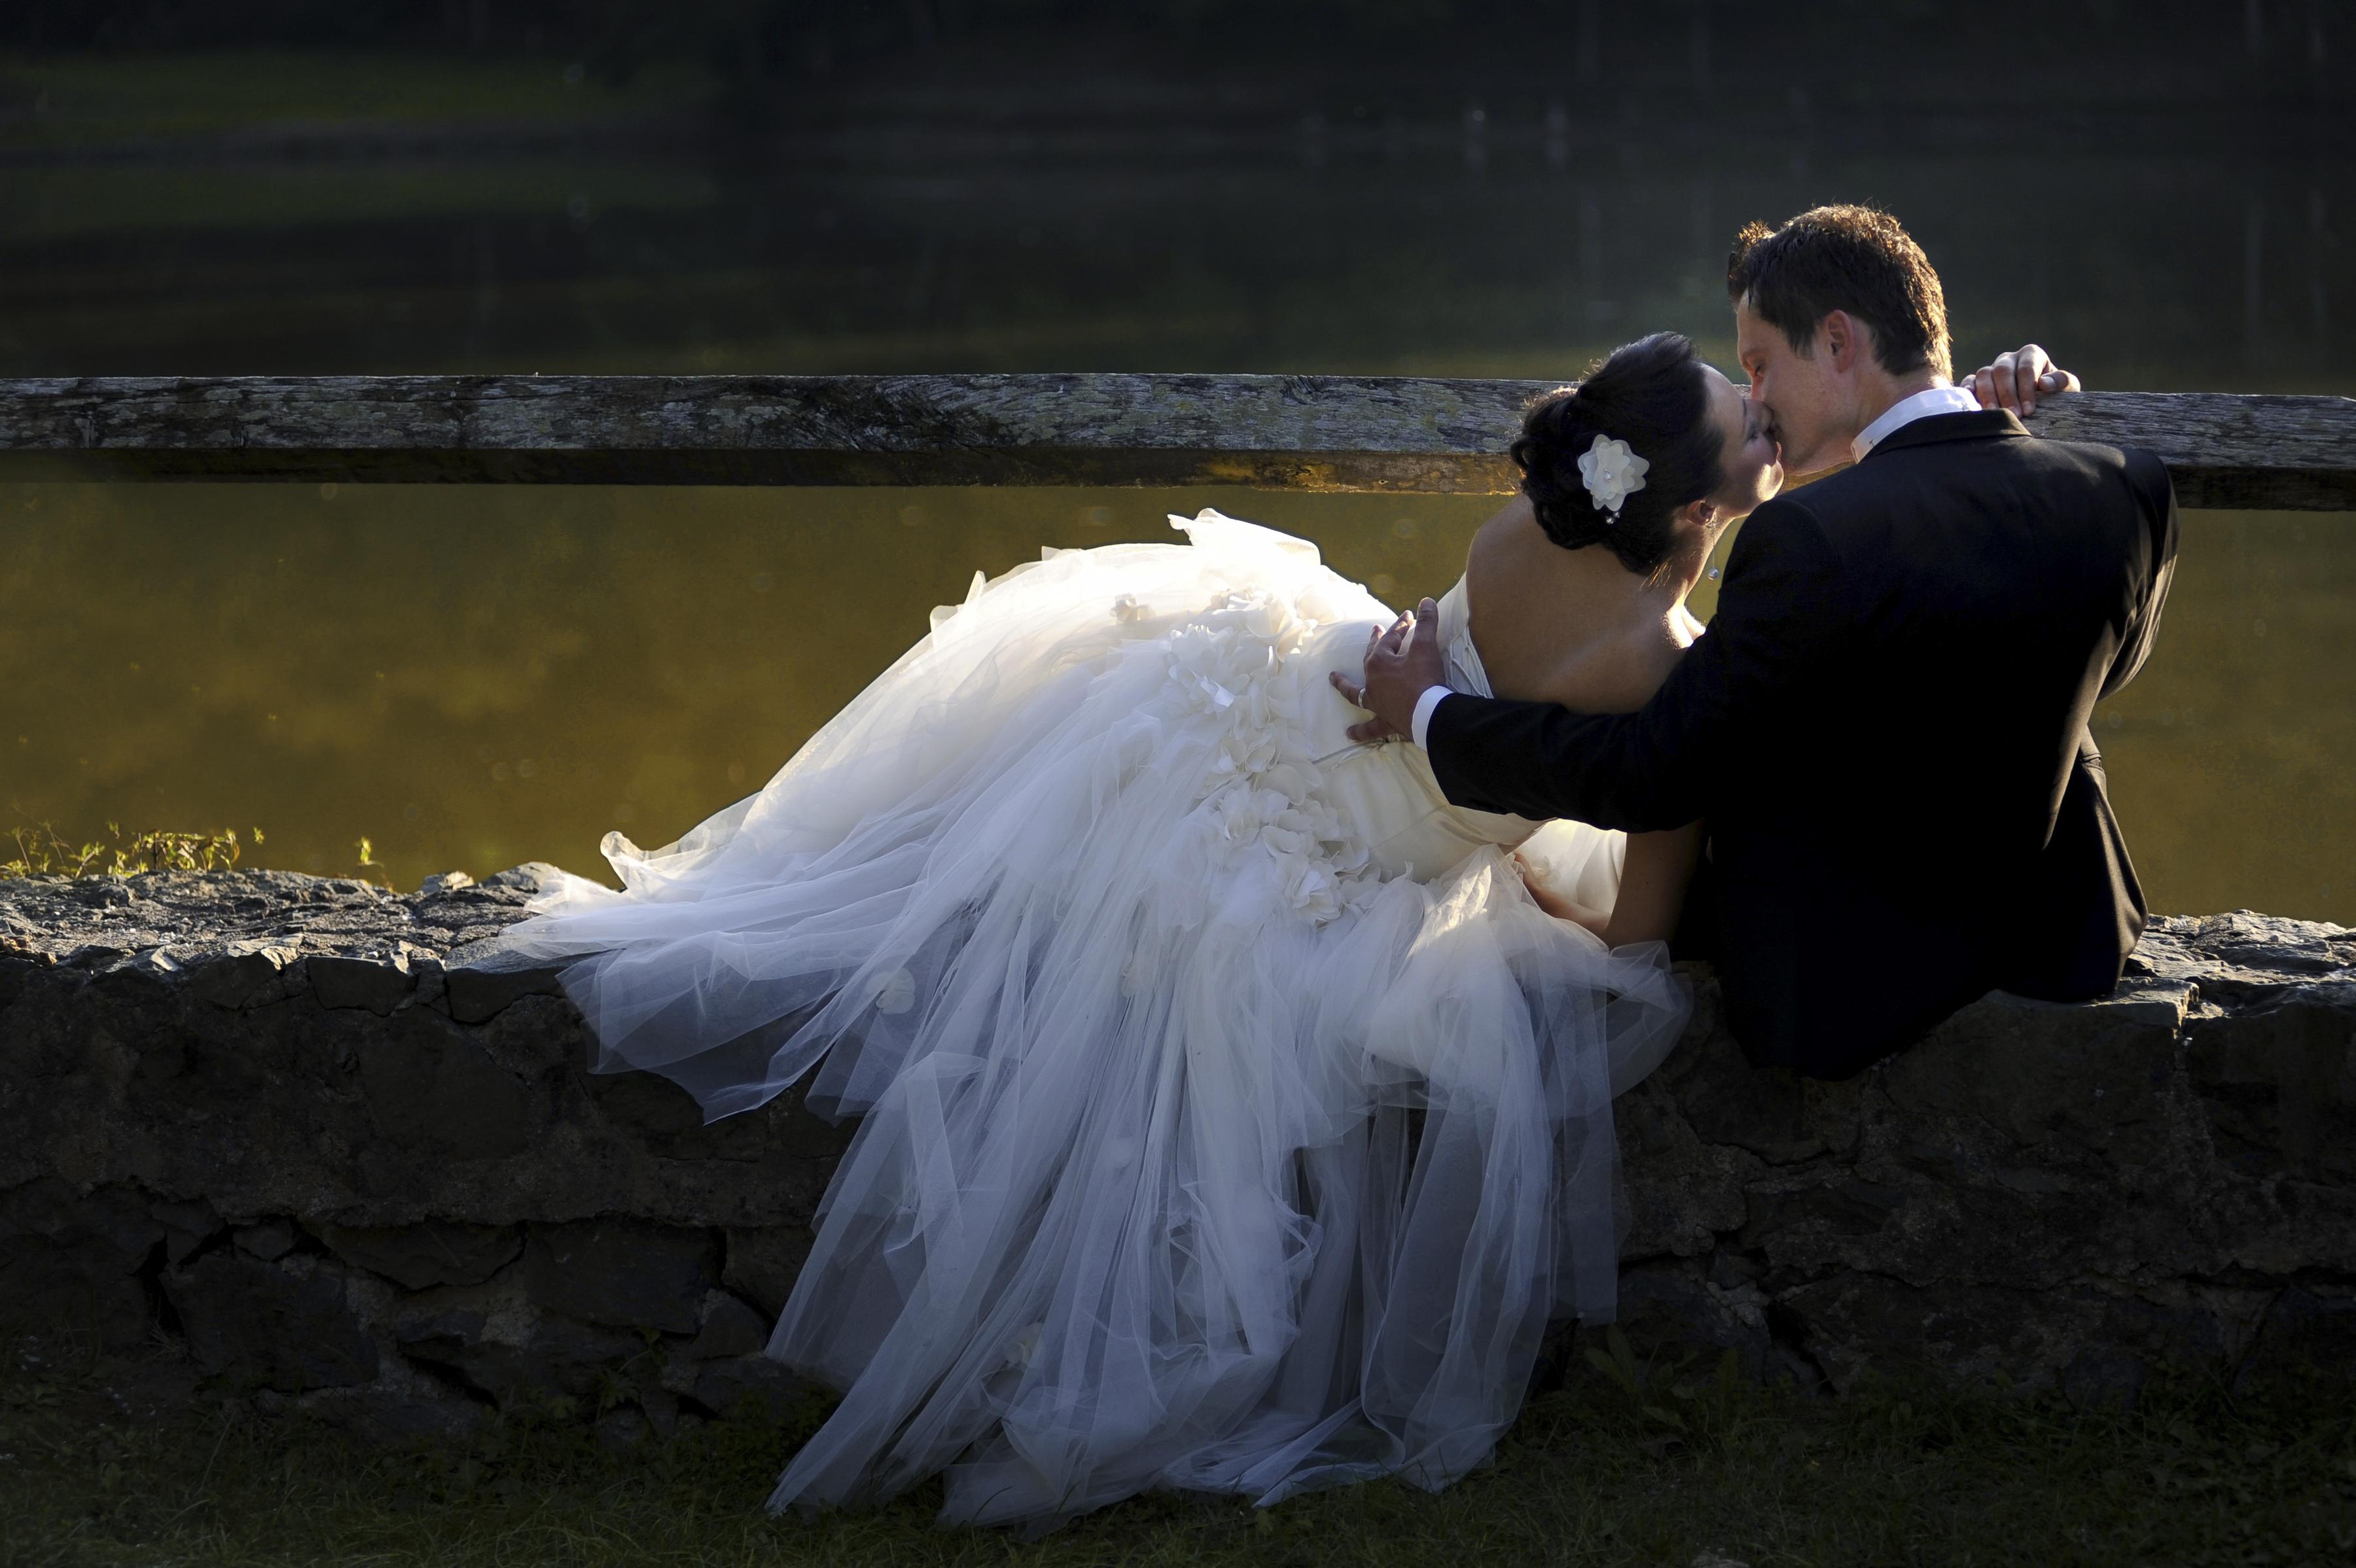 https://sleeklens.com/wp-content/uploads/2018/09/wedding-lightroom-presets-signature-bride-groom-before-3.jpg